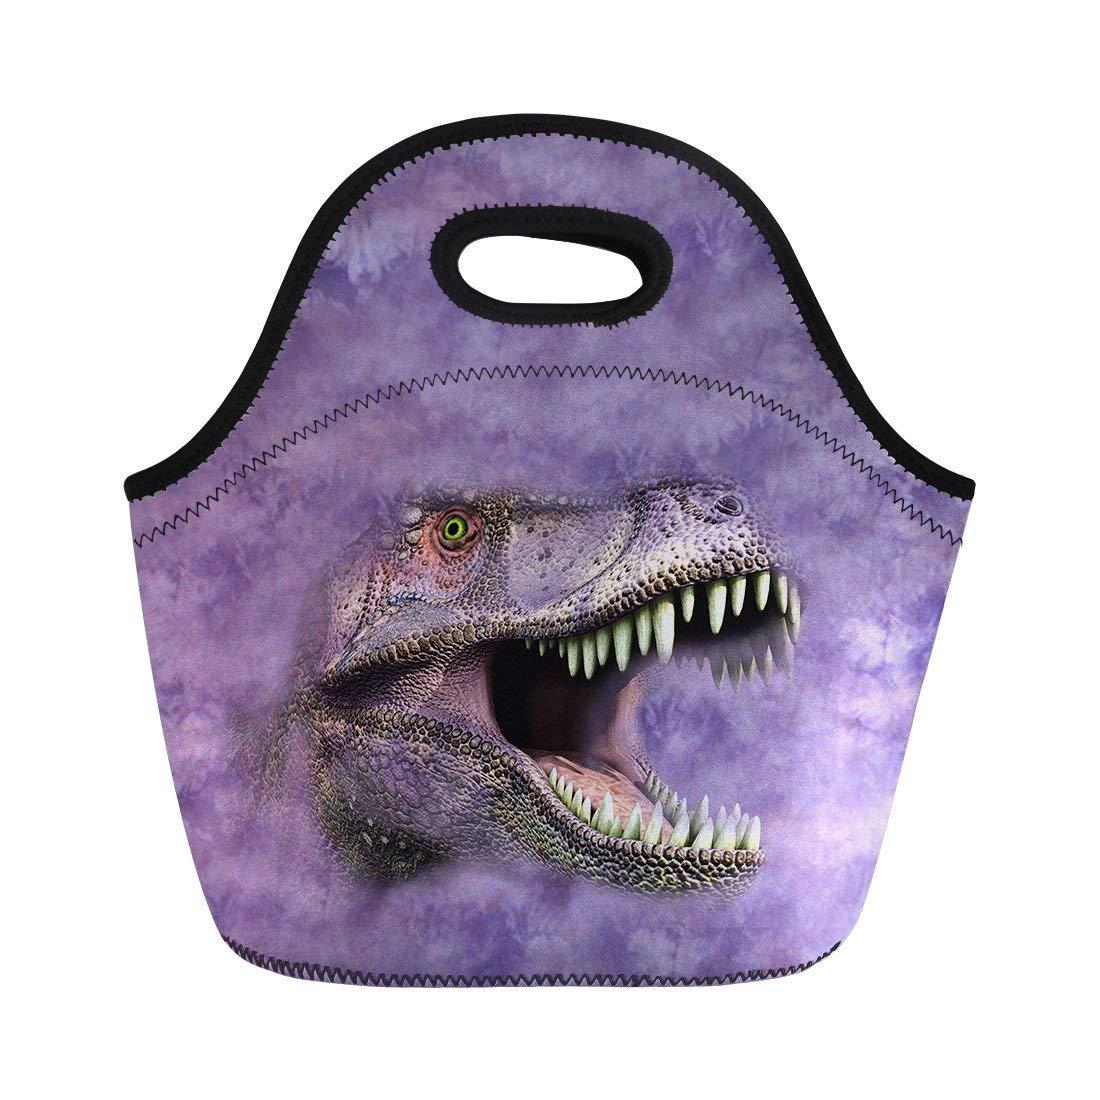 a40b3a87d92e Cheap Dinosaur Lunch Bag, find Dinosaur Lunch Bag deals on line at ...